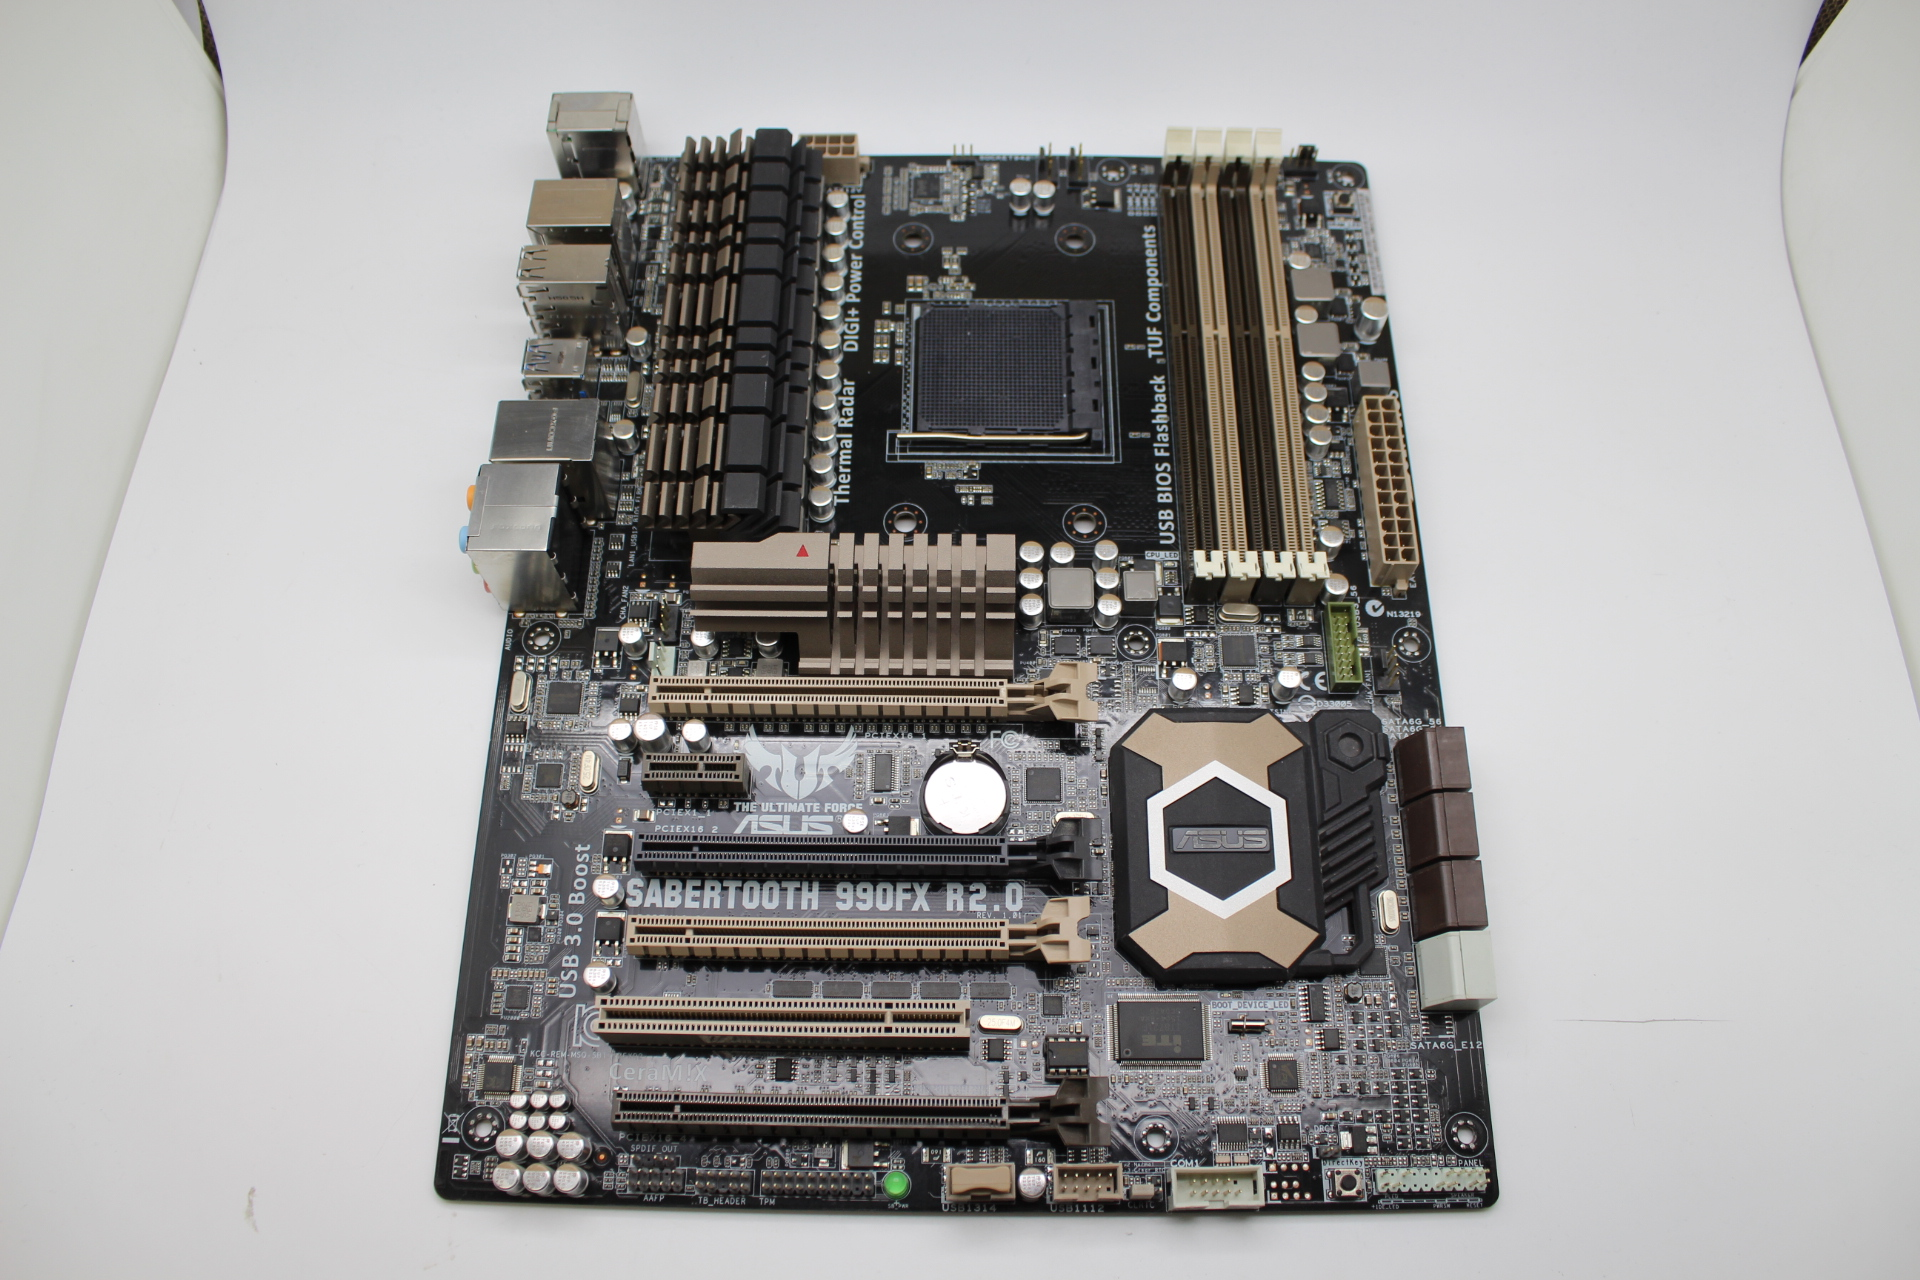 Asus Sabertooth 990fx R2 0 Socket Am3  Ddr3 Usb3 1 Amd 990fx Atx Motherboard